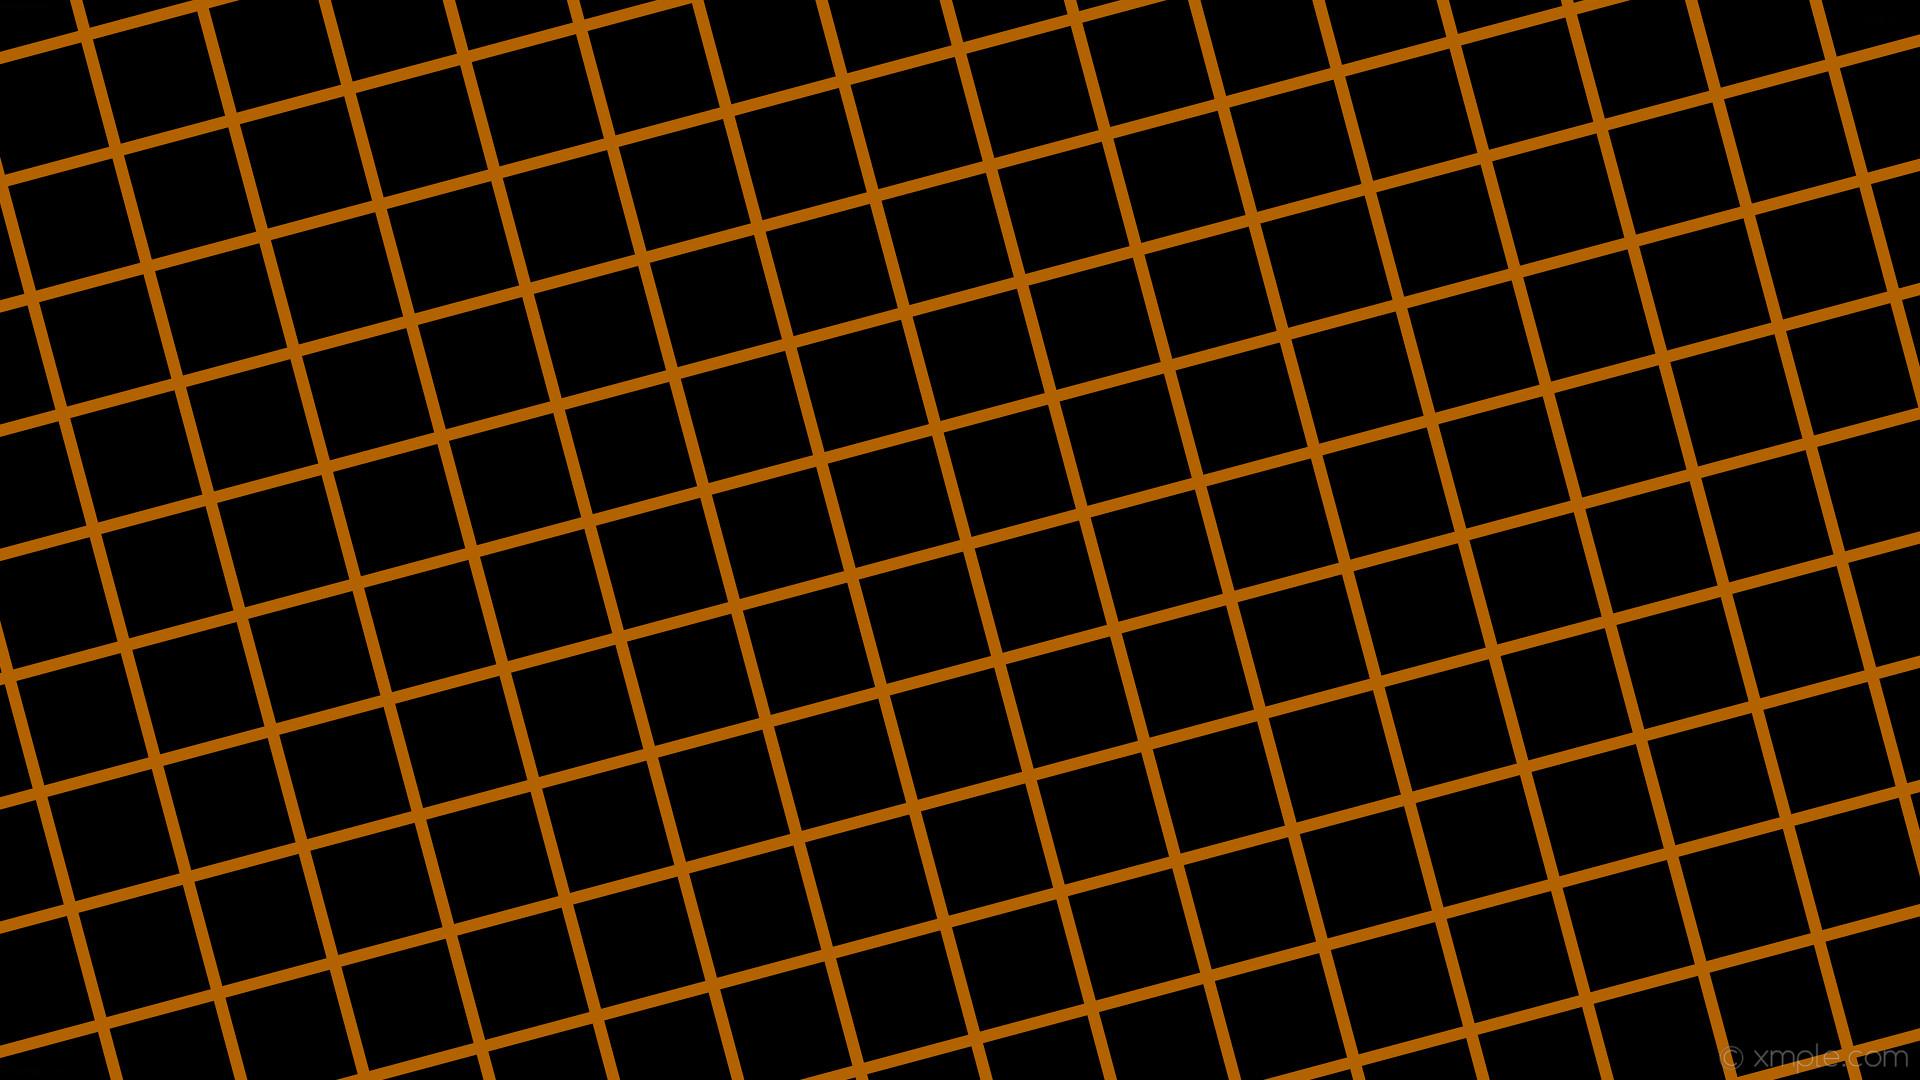 wallpaper black orange graph paper grid dark orange #000000 #ff8c00 15°  12px 120px